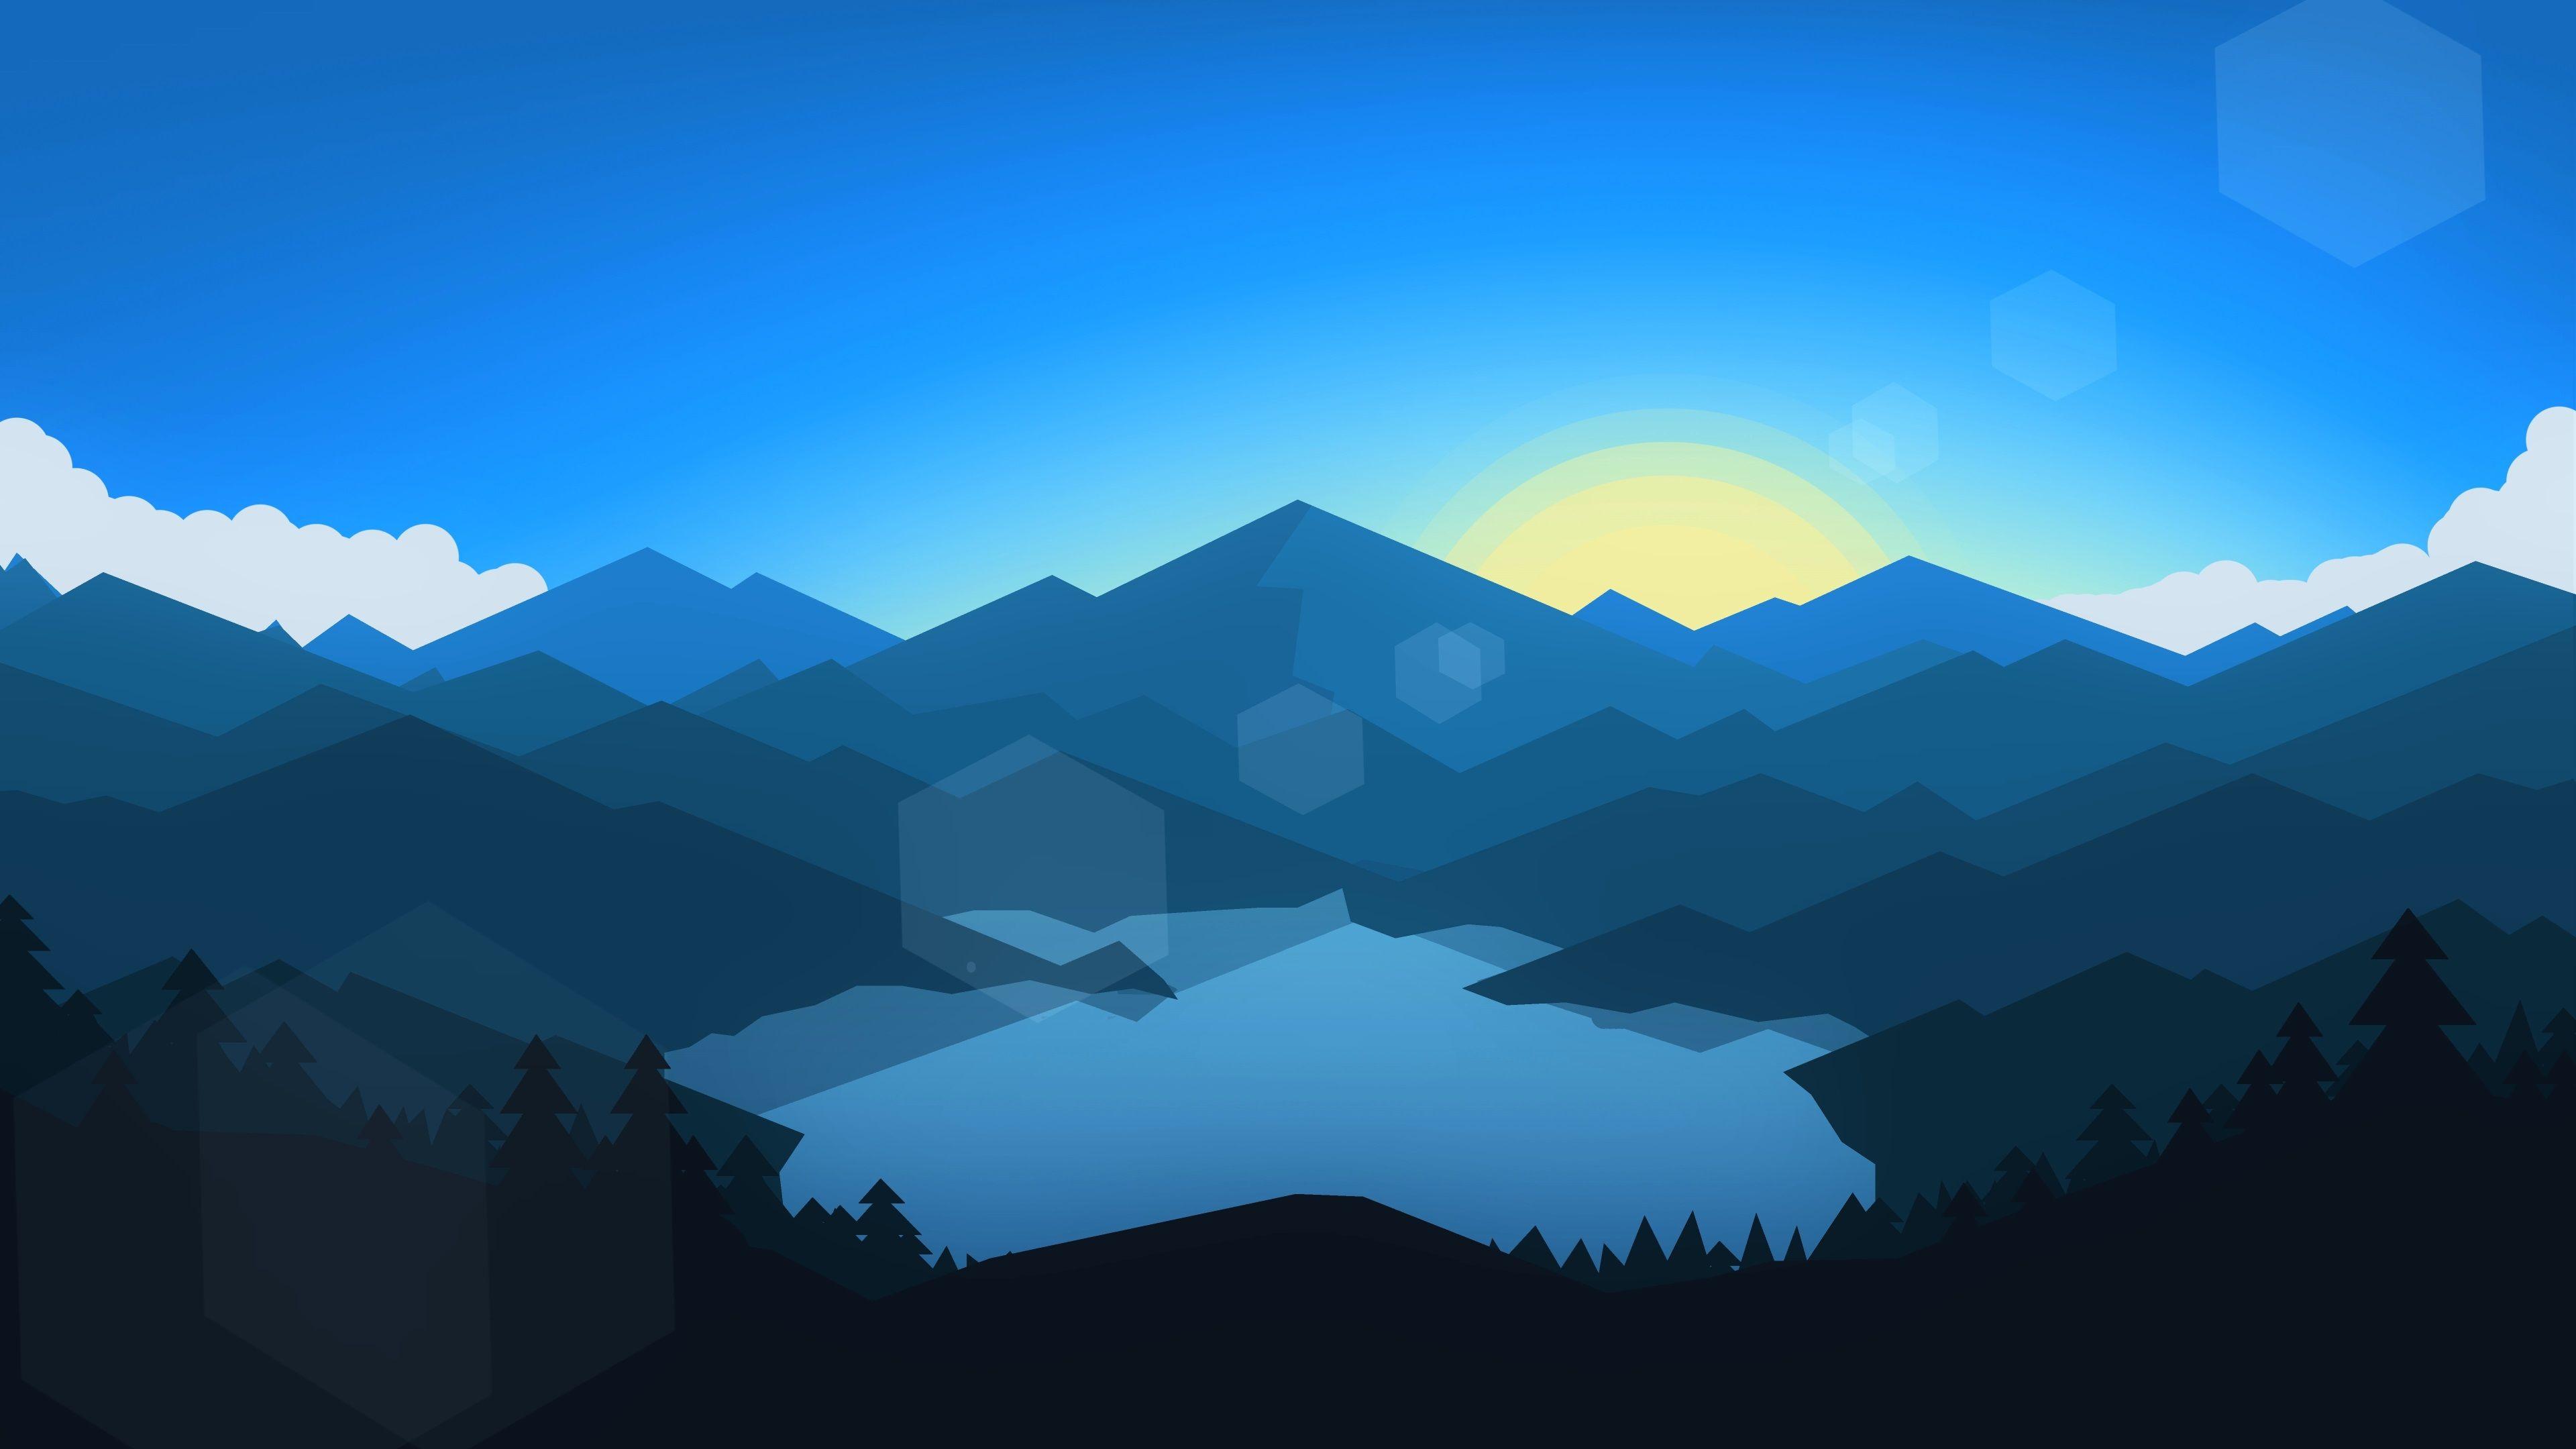 3840x2160 Minimalism 4k Screen Wallpaper Free Download Banner